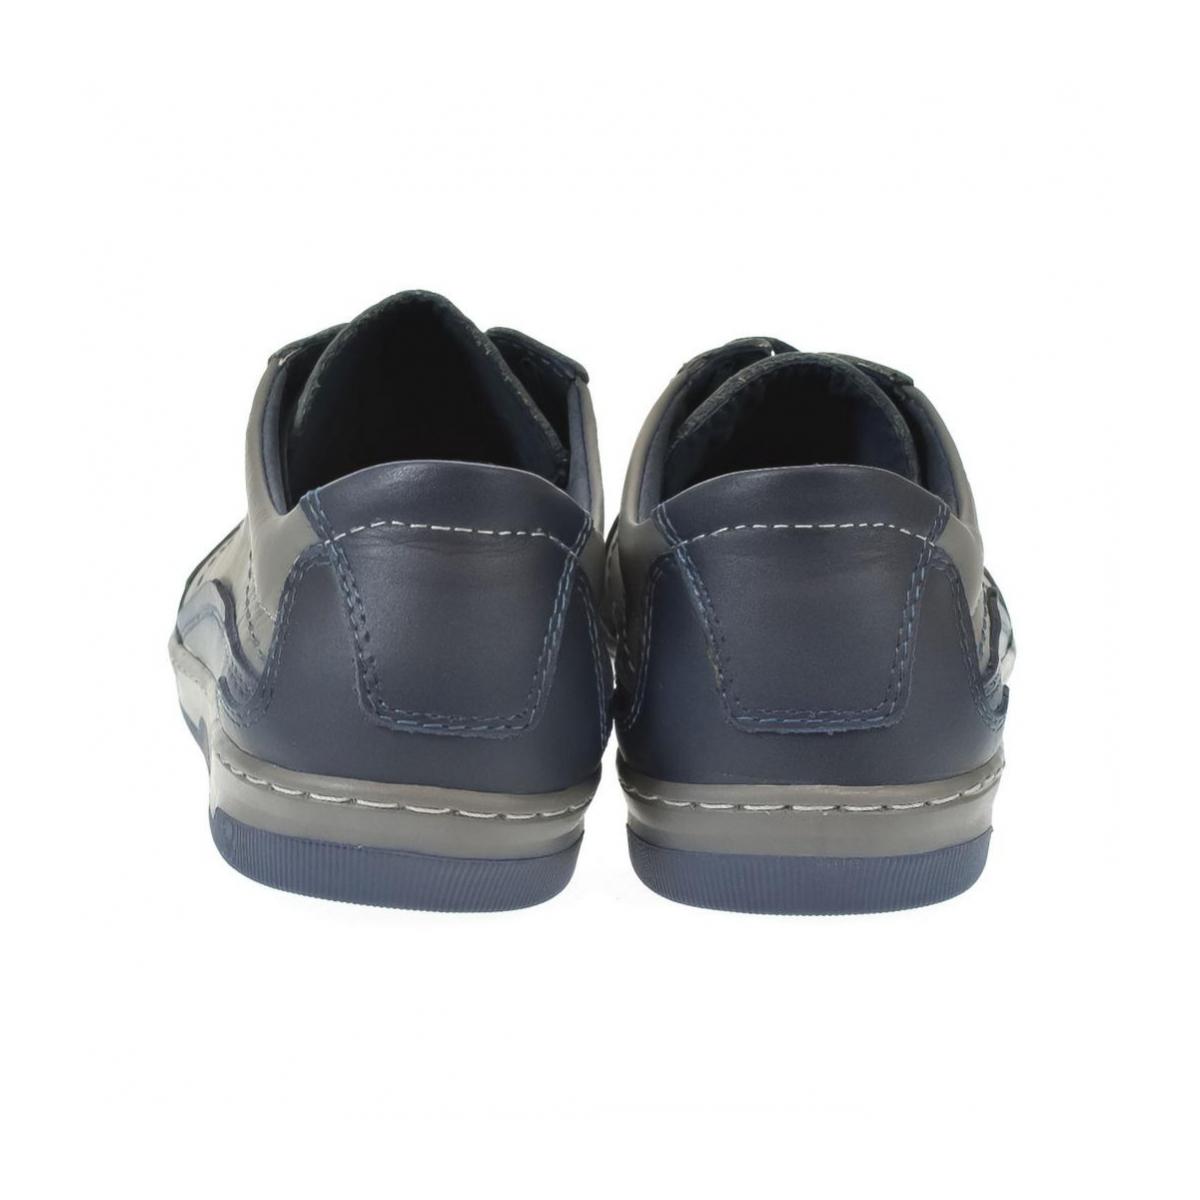 Pánske kožené sivé topánky ROY - 5 0d8c7823a9a